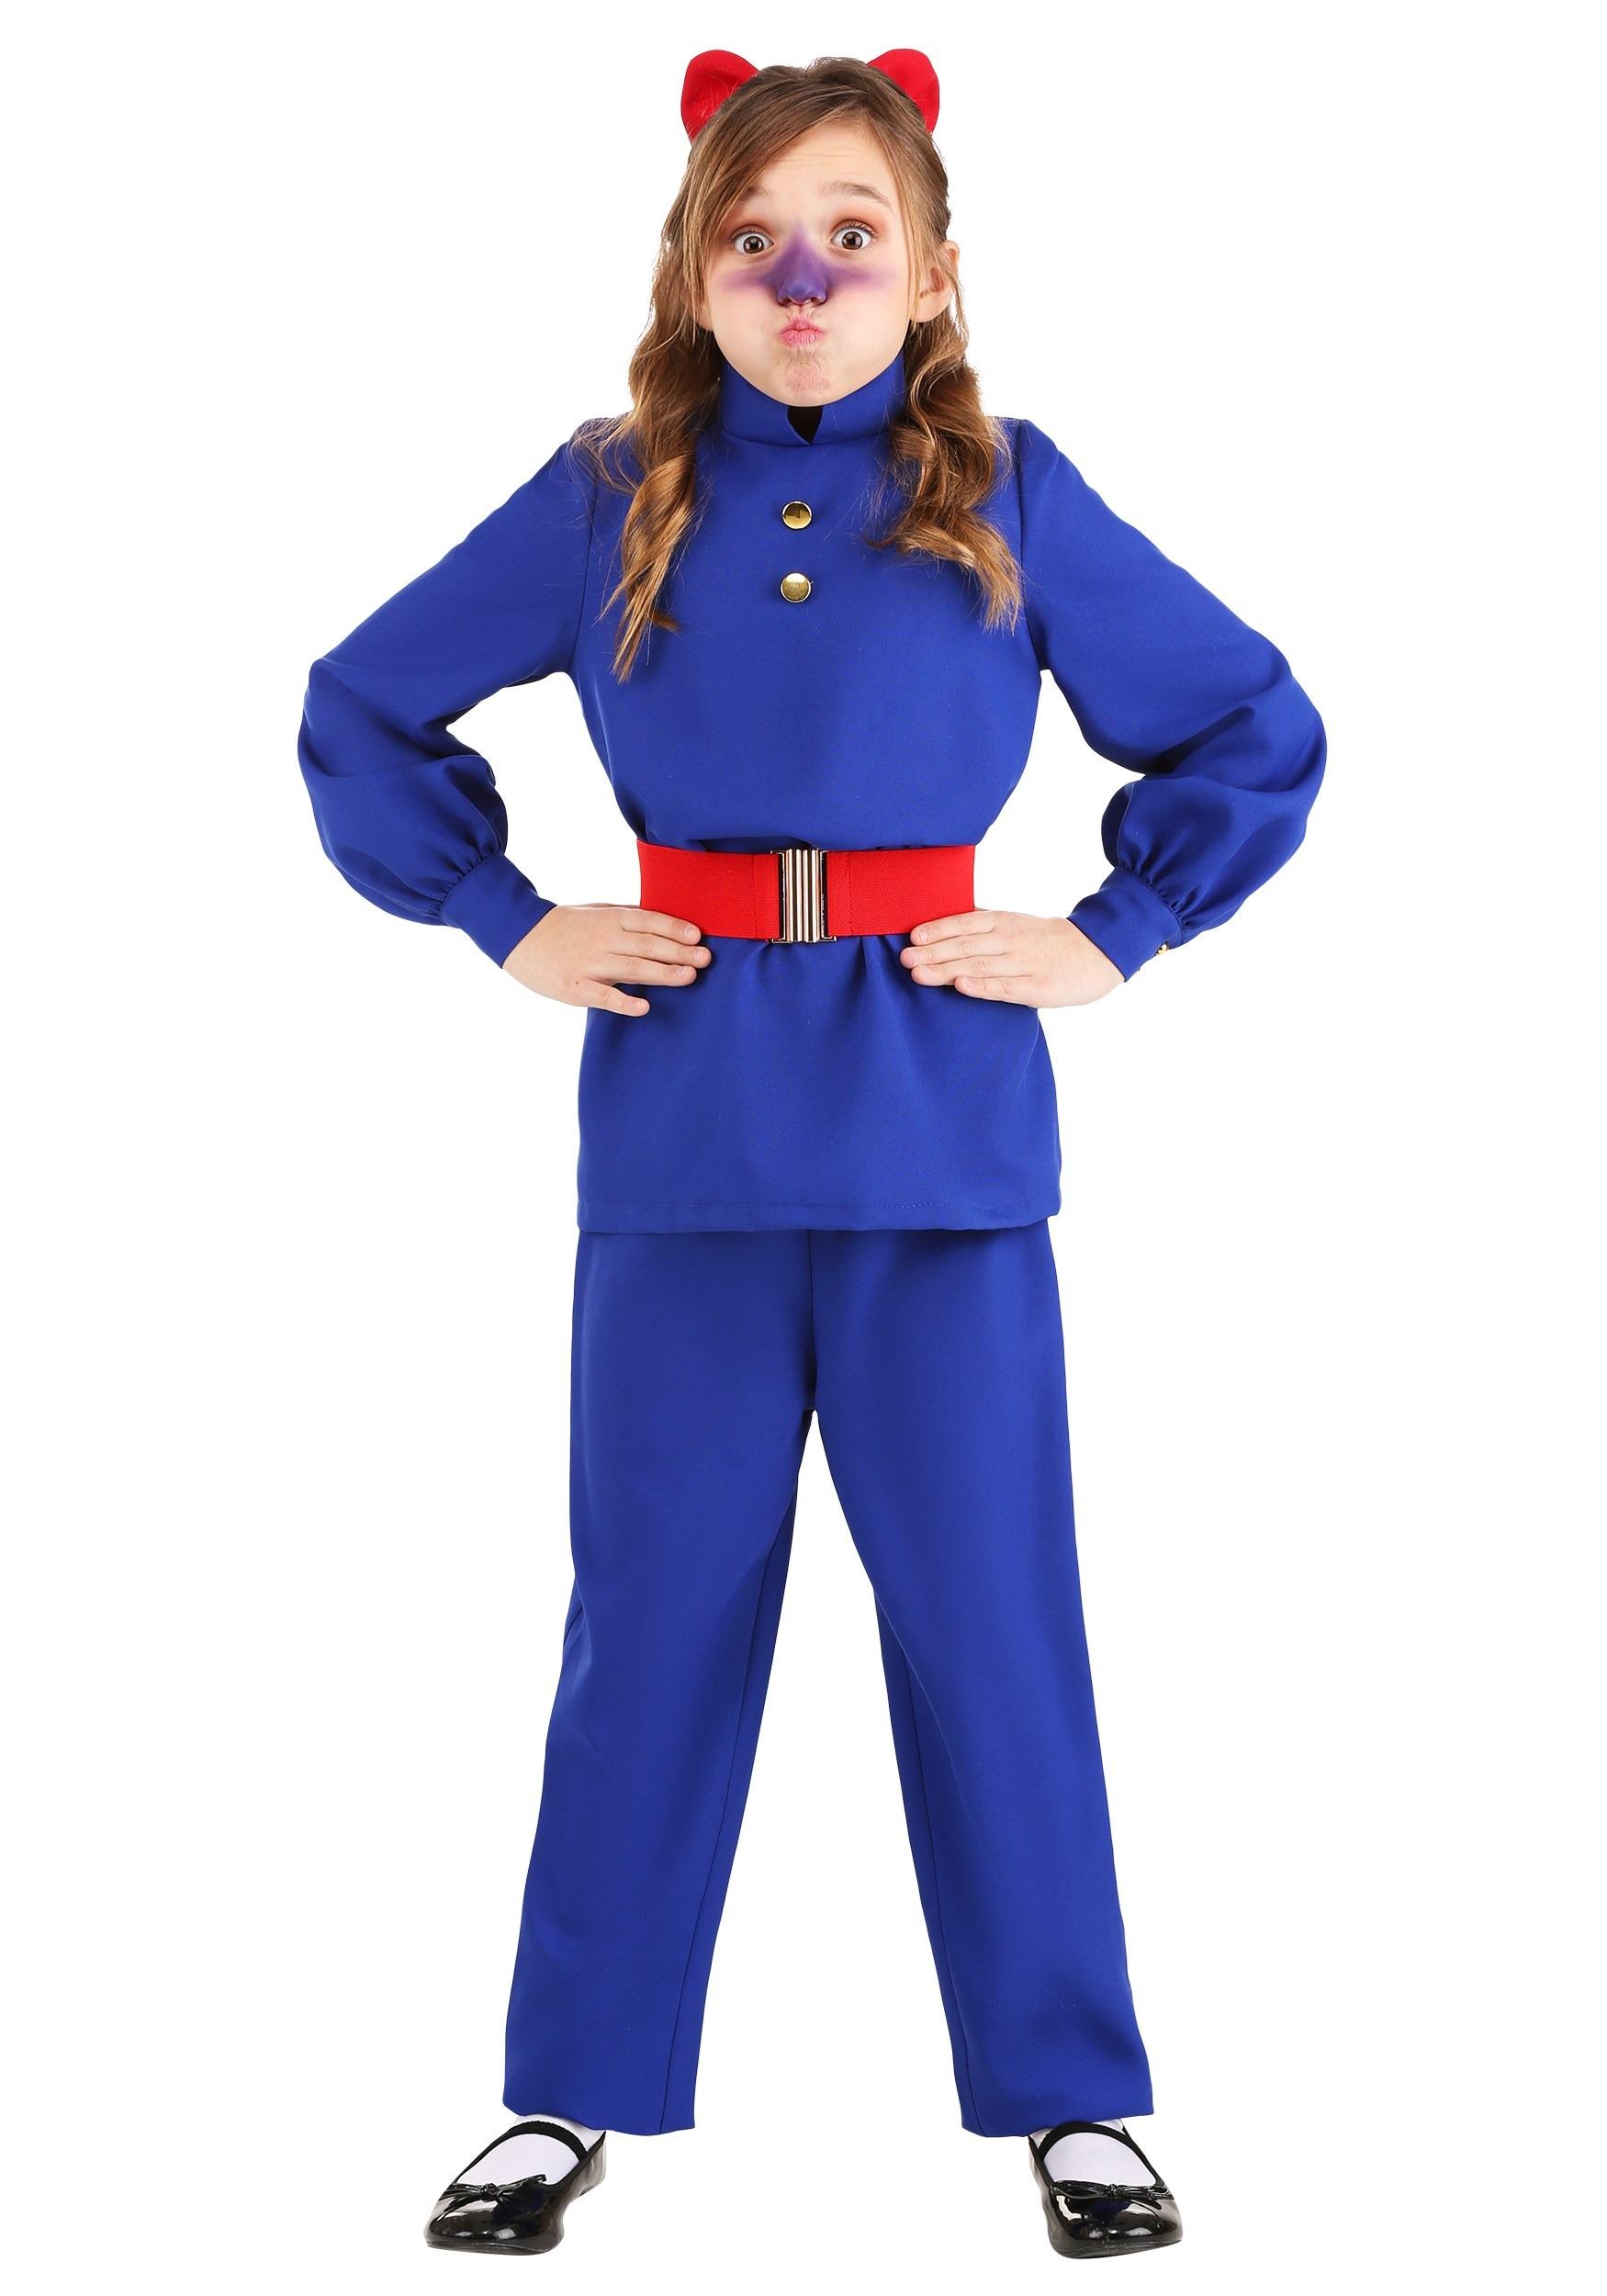 Willy Wonka Violet Beauregarde Costume for Kids